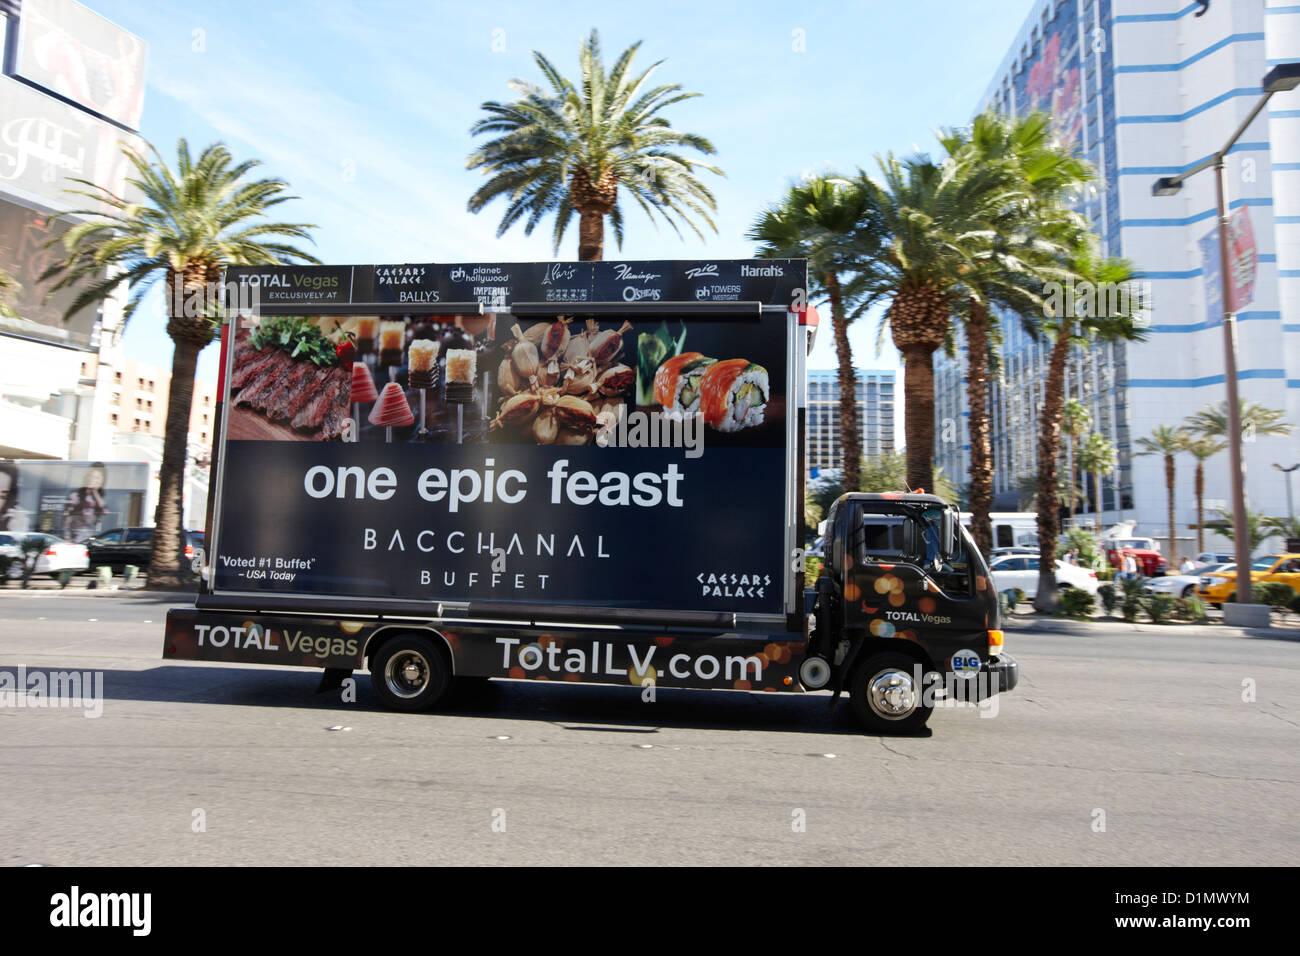 mobile advertising billboard advertising buffet on the strip in Las Vegas Nevada USA - Stock Image